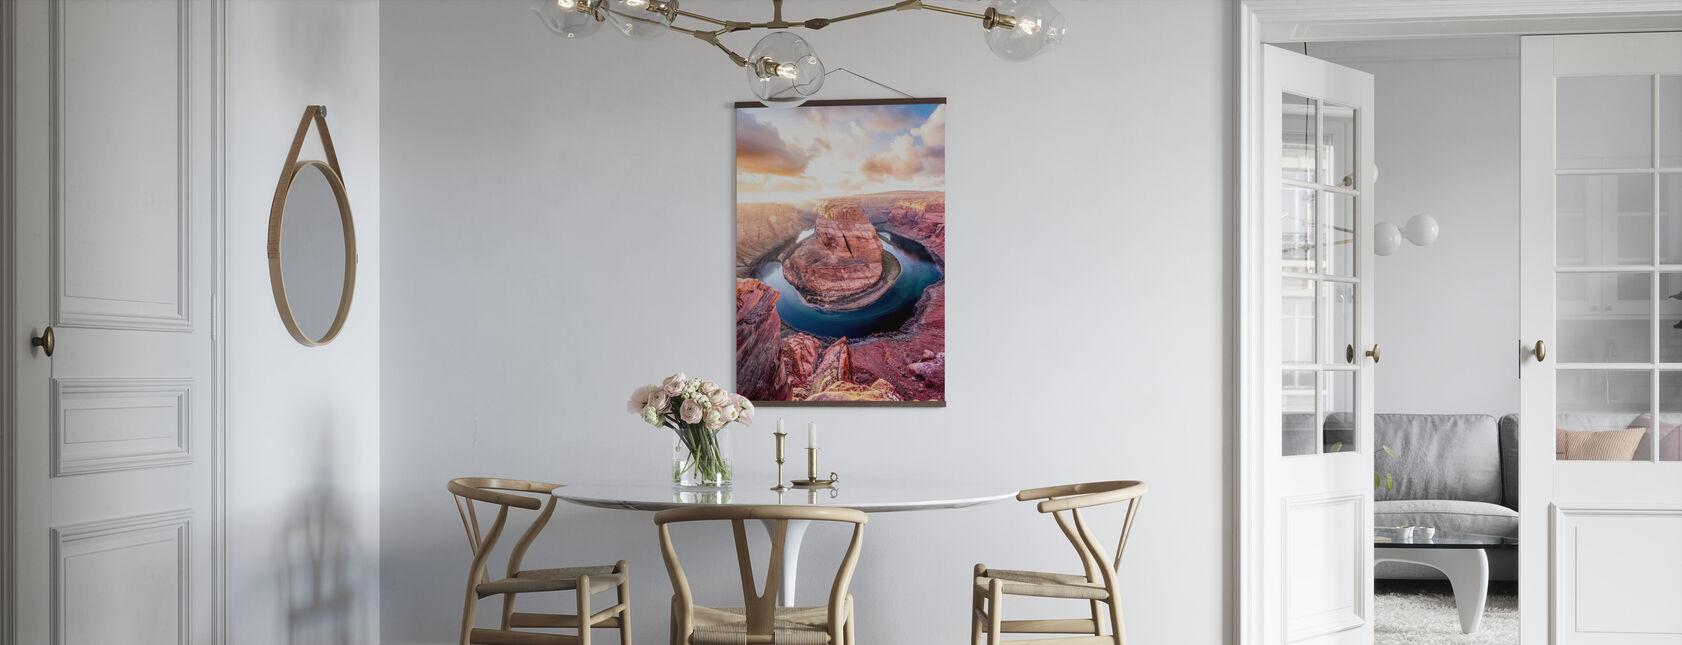 Arizona Canyon - Poster - Kitchen